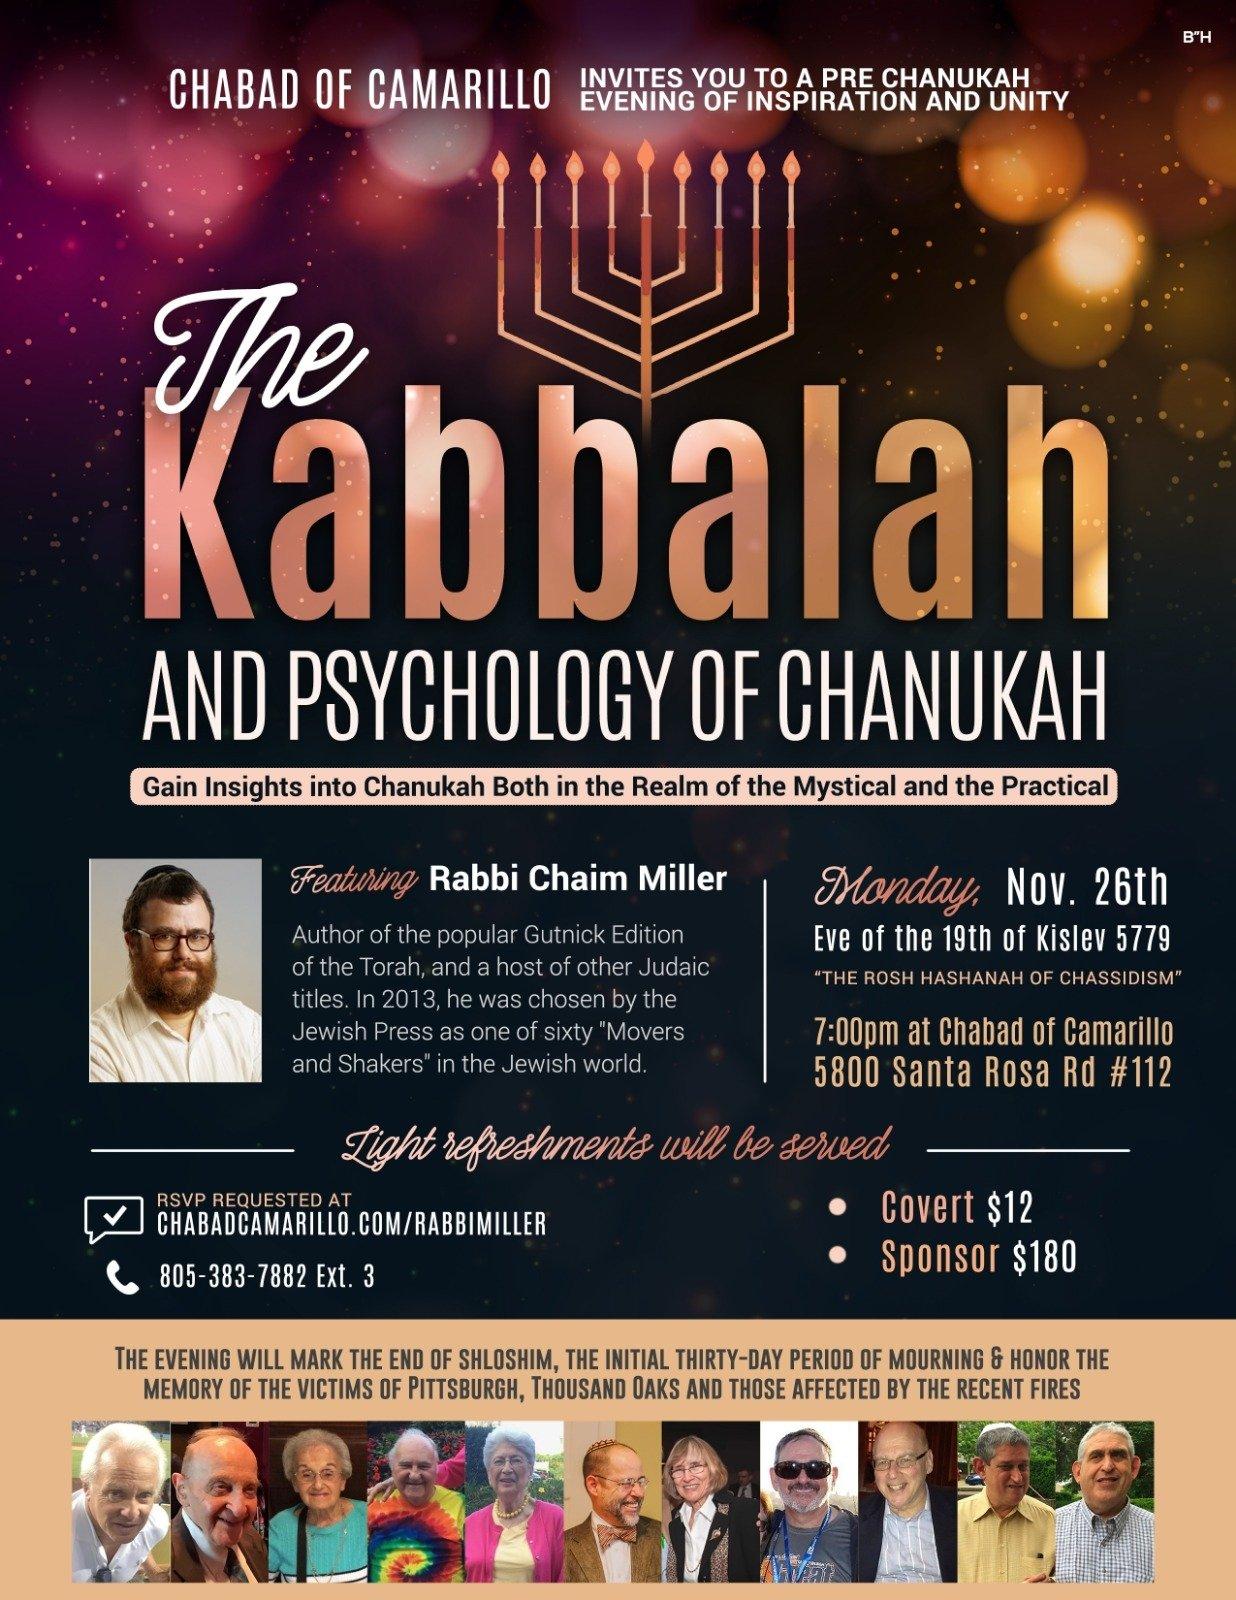 The Kabbalah and Psychology of Chanukah - Chabad Jewish